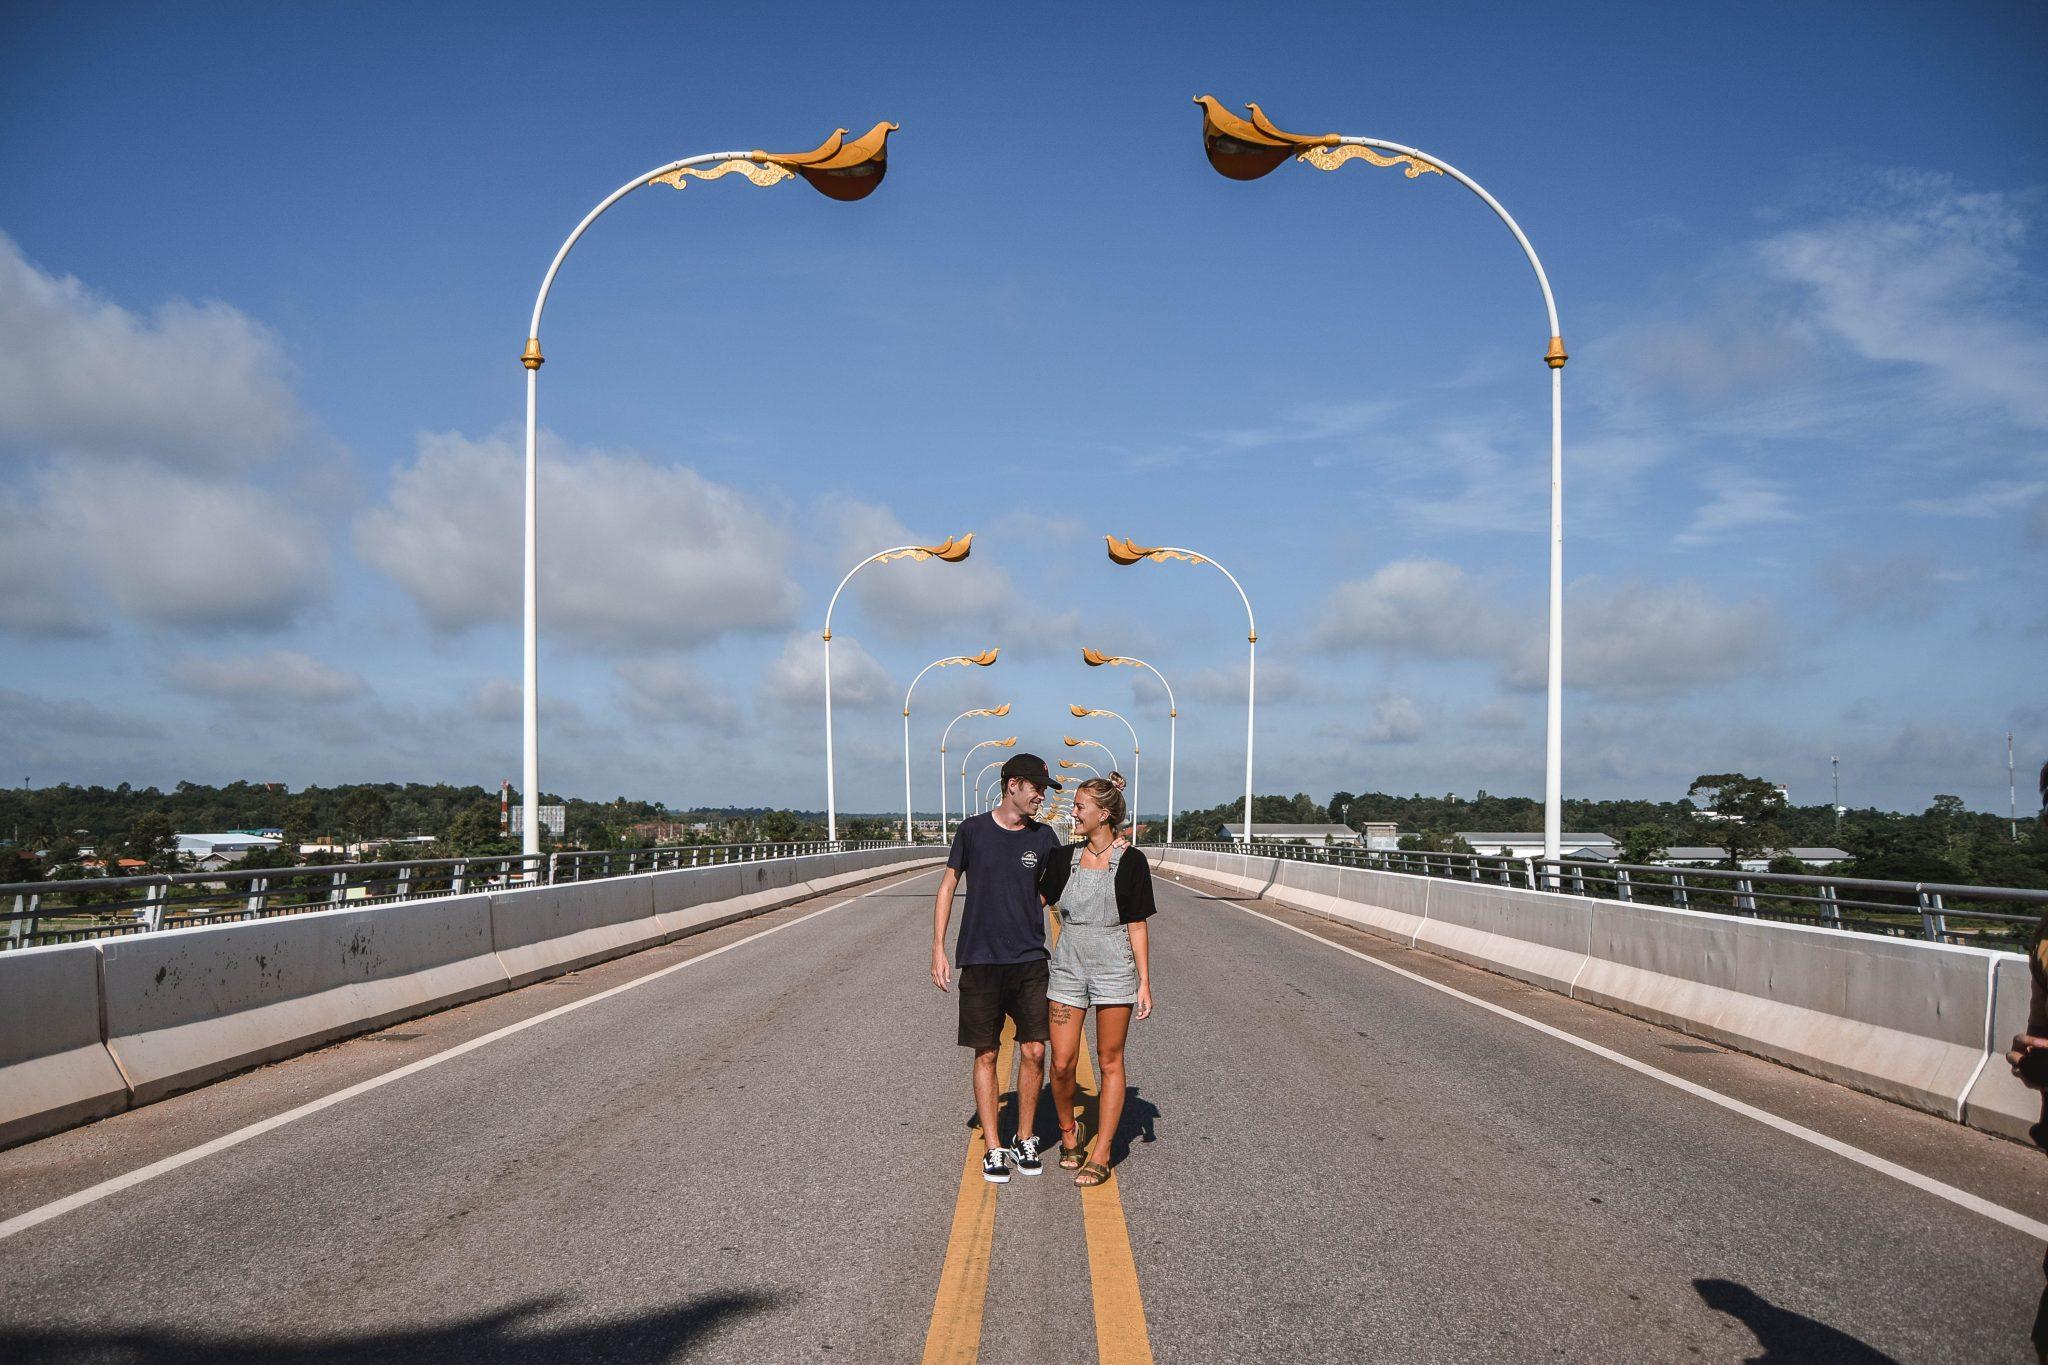 Wanderers & Warriors - Charlie & Lauren UK Travel Couple - 7 Things To Do In Nakhon Phanom - 3rd thai-laos friendship bridge